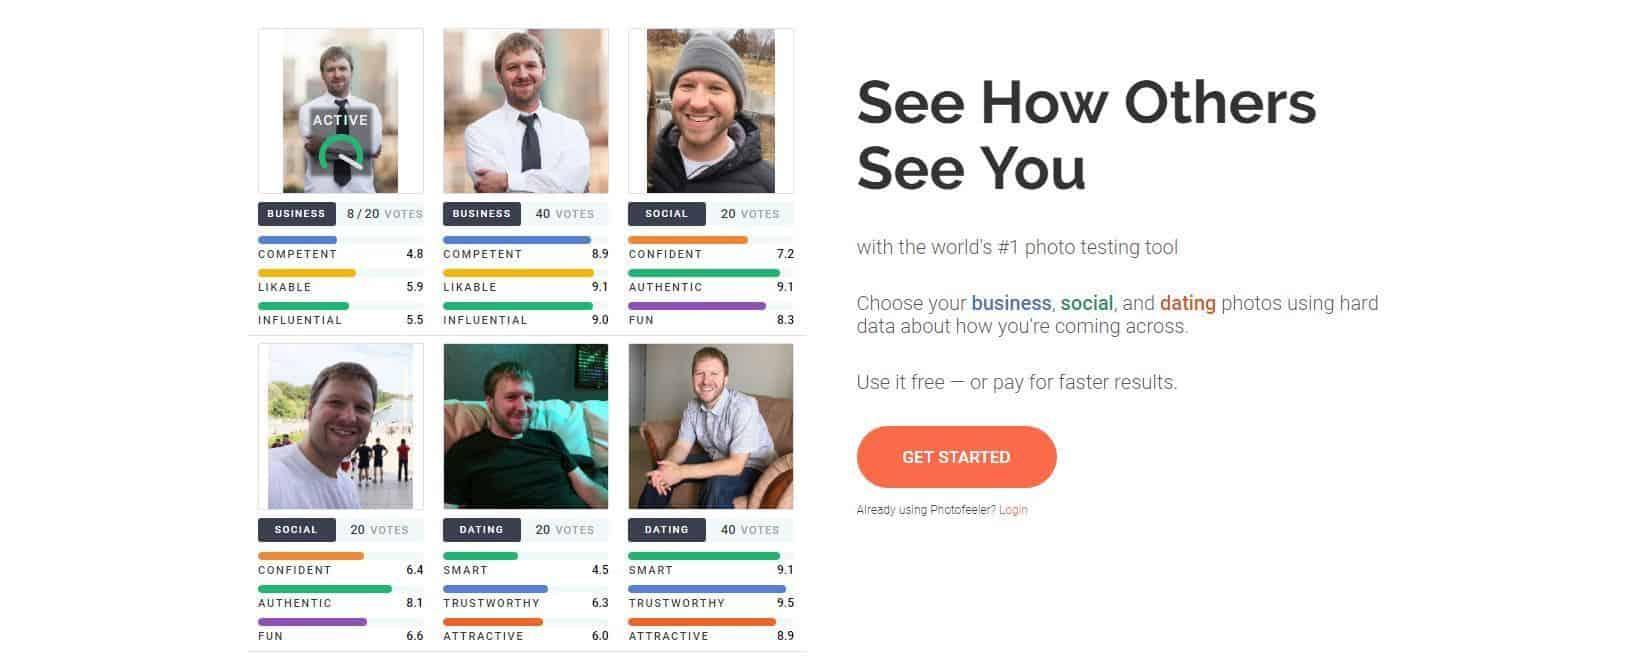 tinder profilfoto mann online dating photofeeler